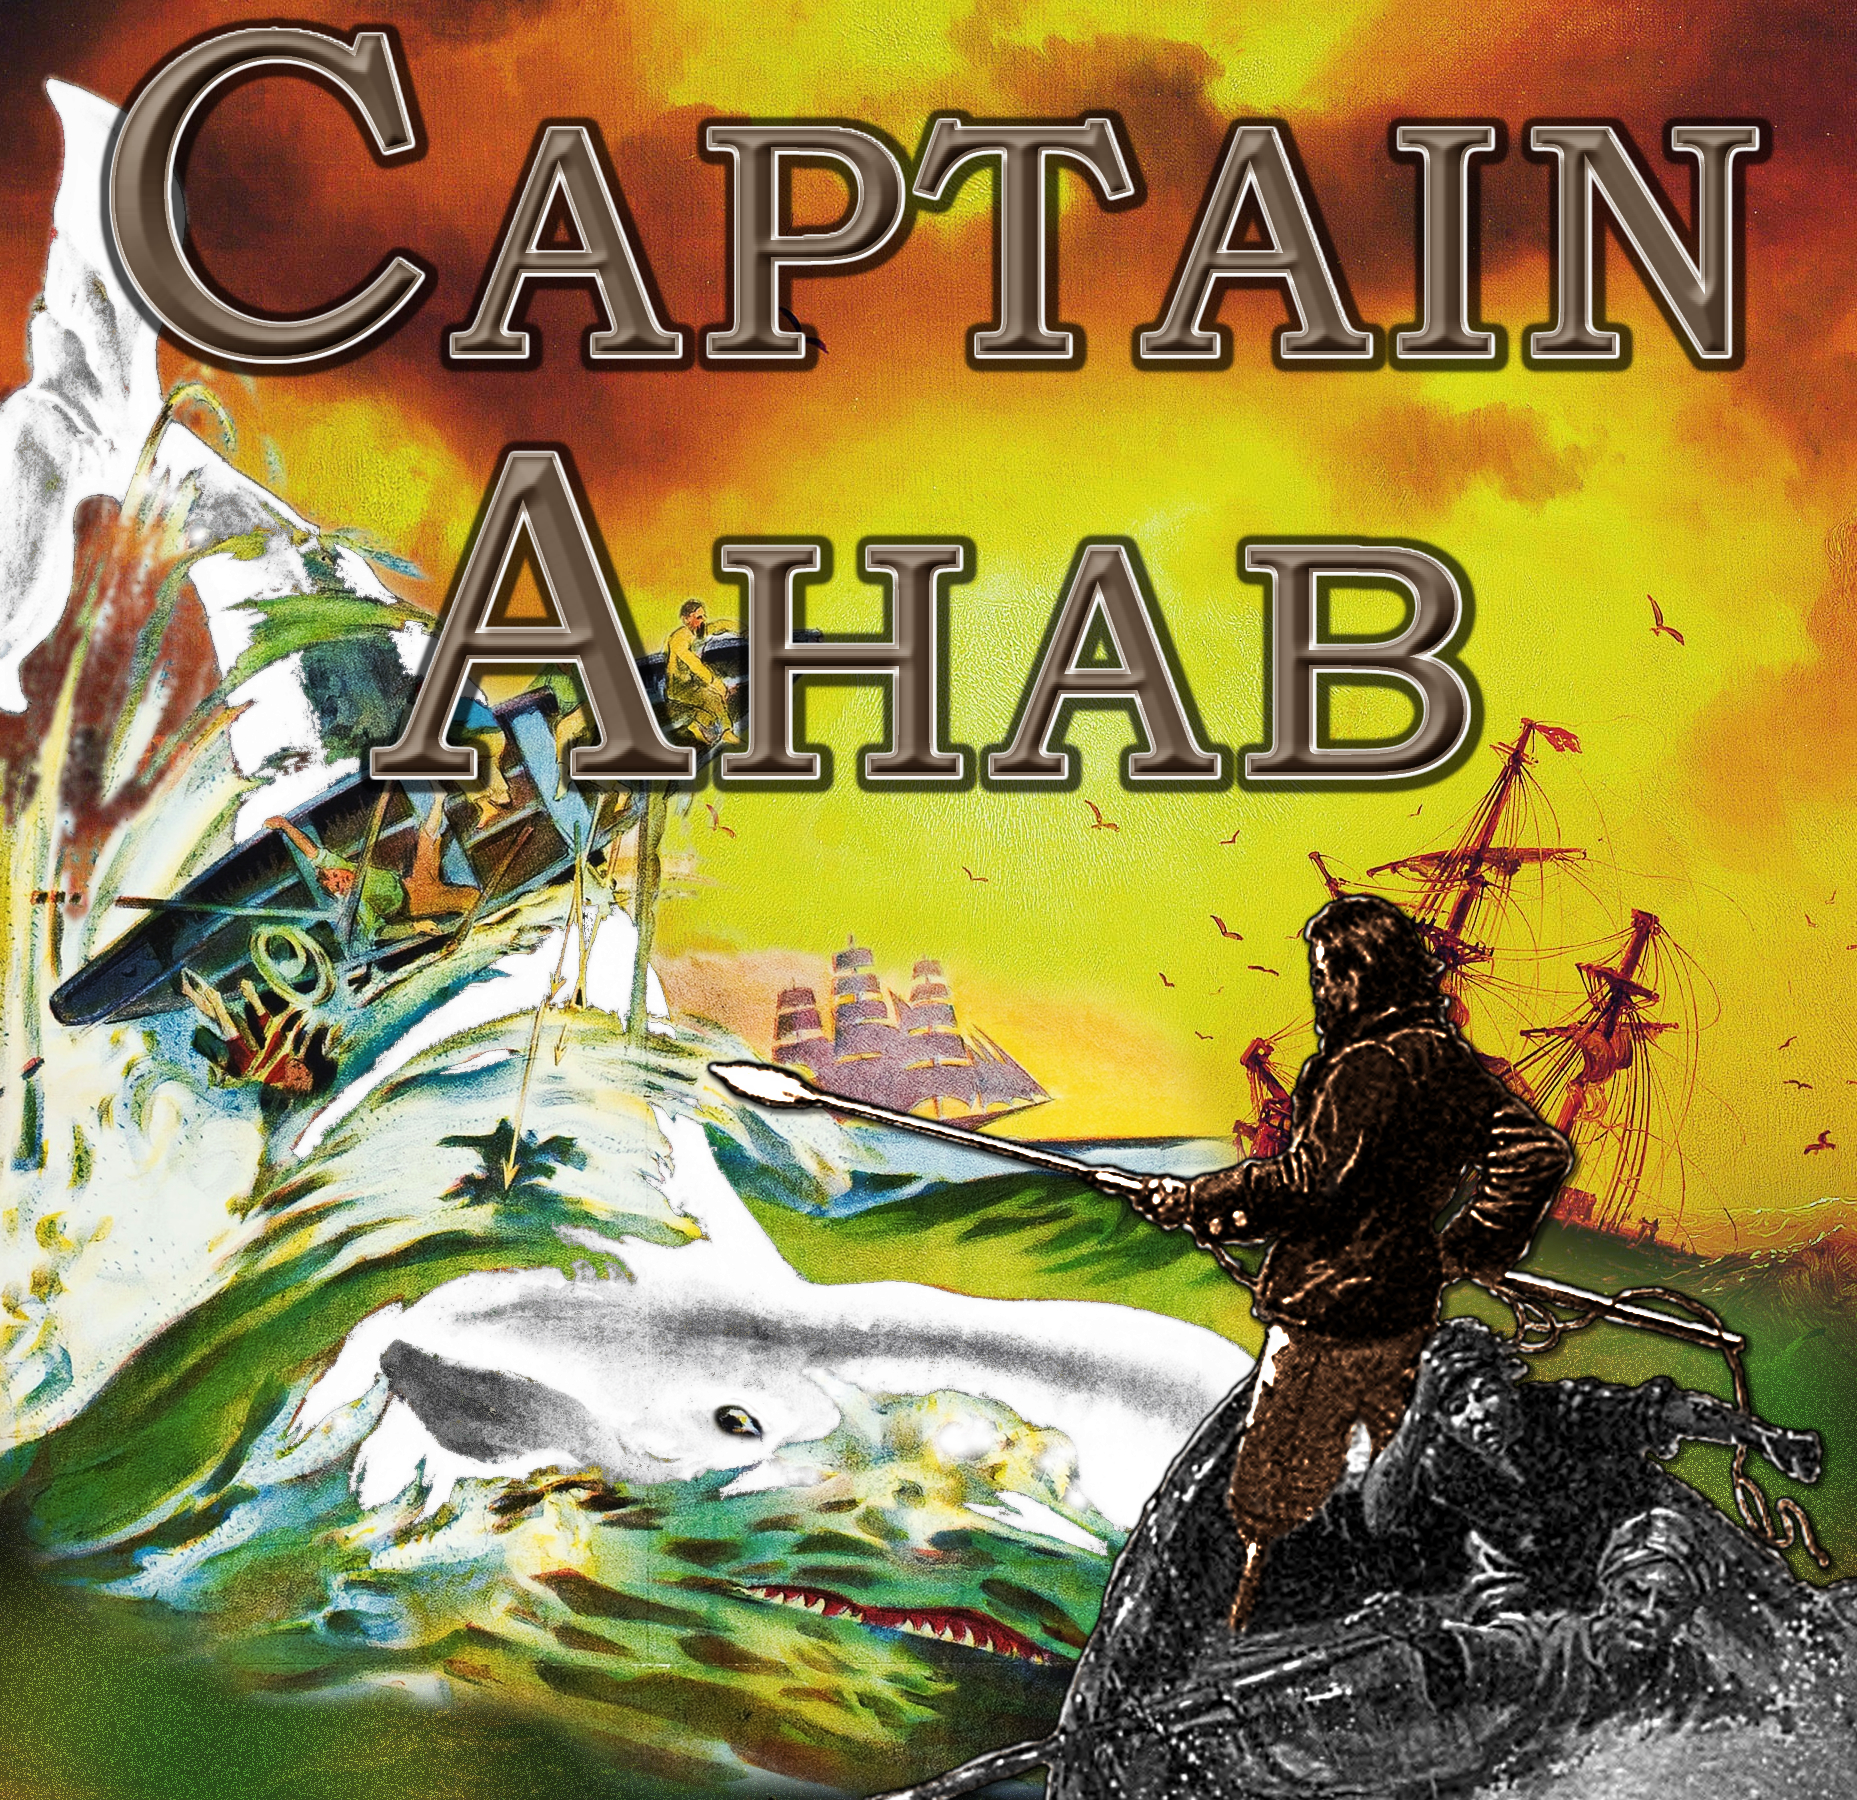 Captain Ahab DnD 5e banner.jpg